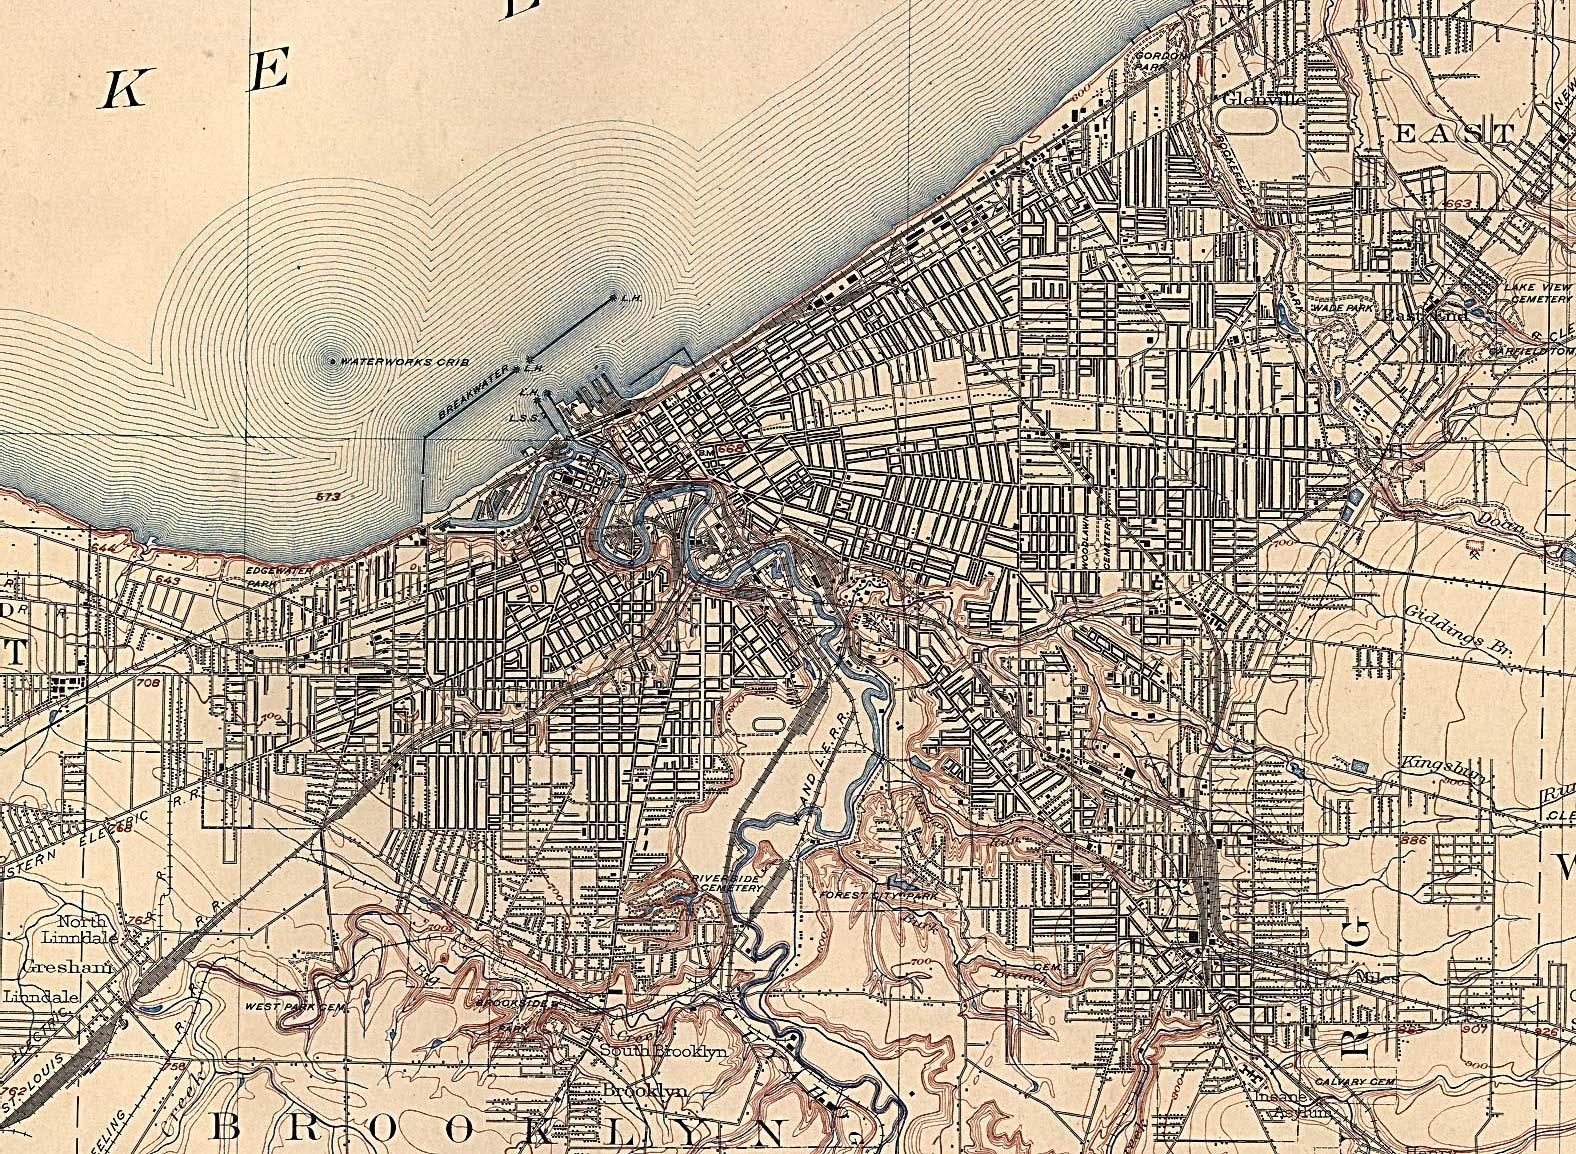 Free Ohio Map.Download Free Ohio Maps